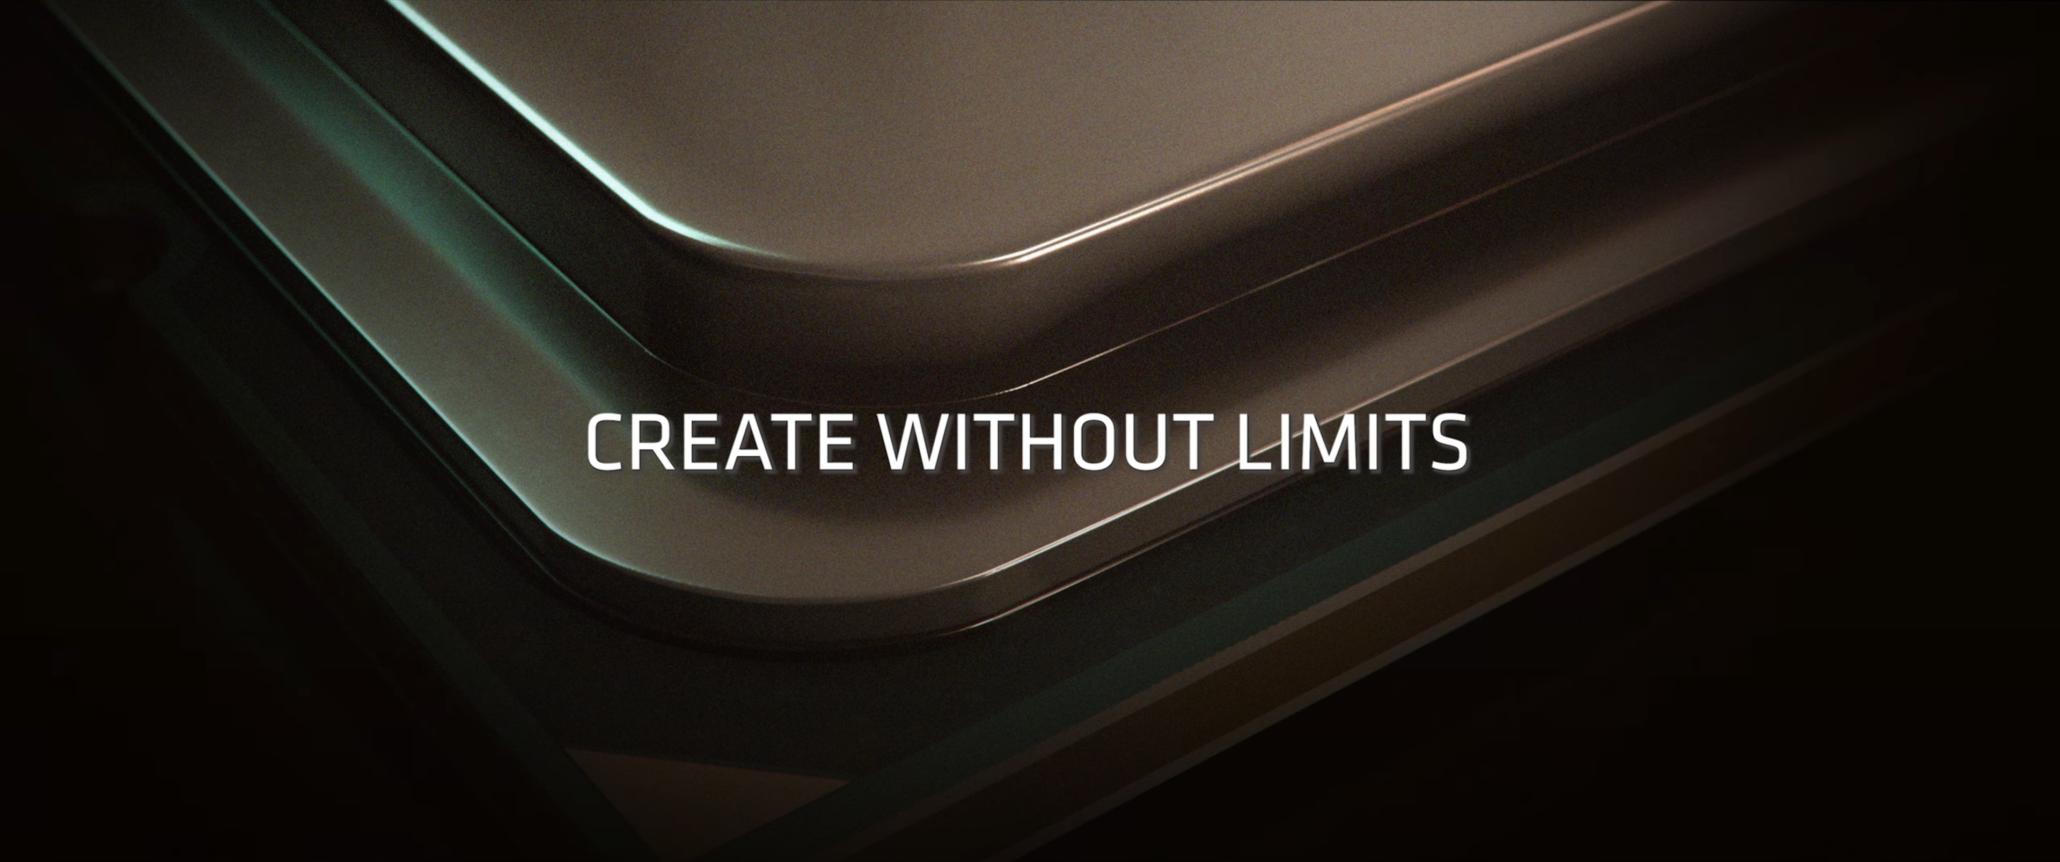 AMD Ryzen Threadripper 5975WX 'Chagall' HEDT CPU Dengan 32 Zen 3 Core Telah dibenchmark, 10% Lebih Cepat Dari 64 Core Threadripper 3990X